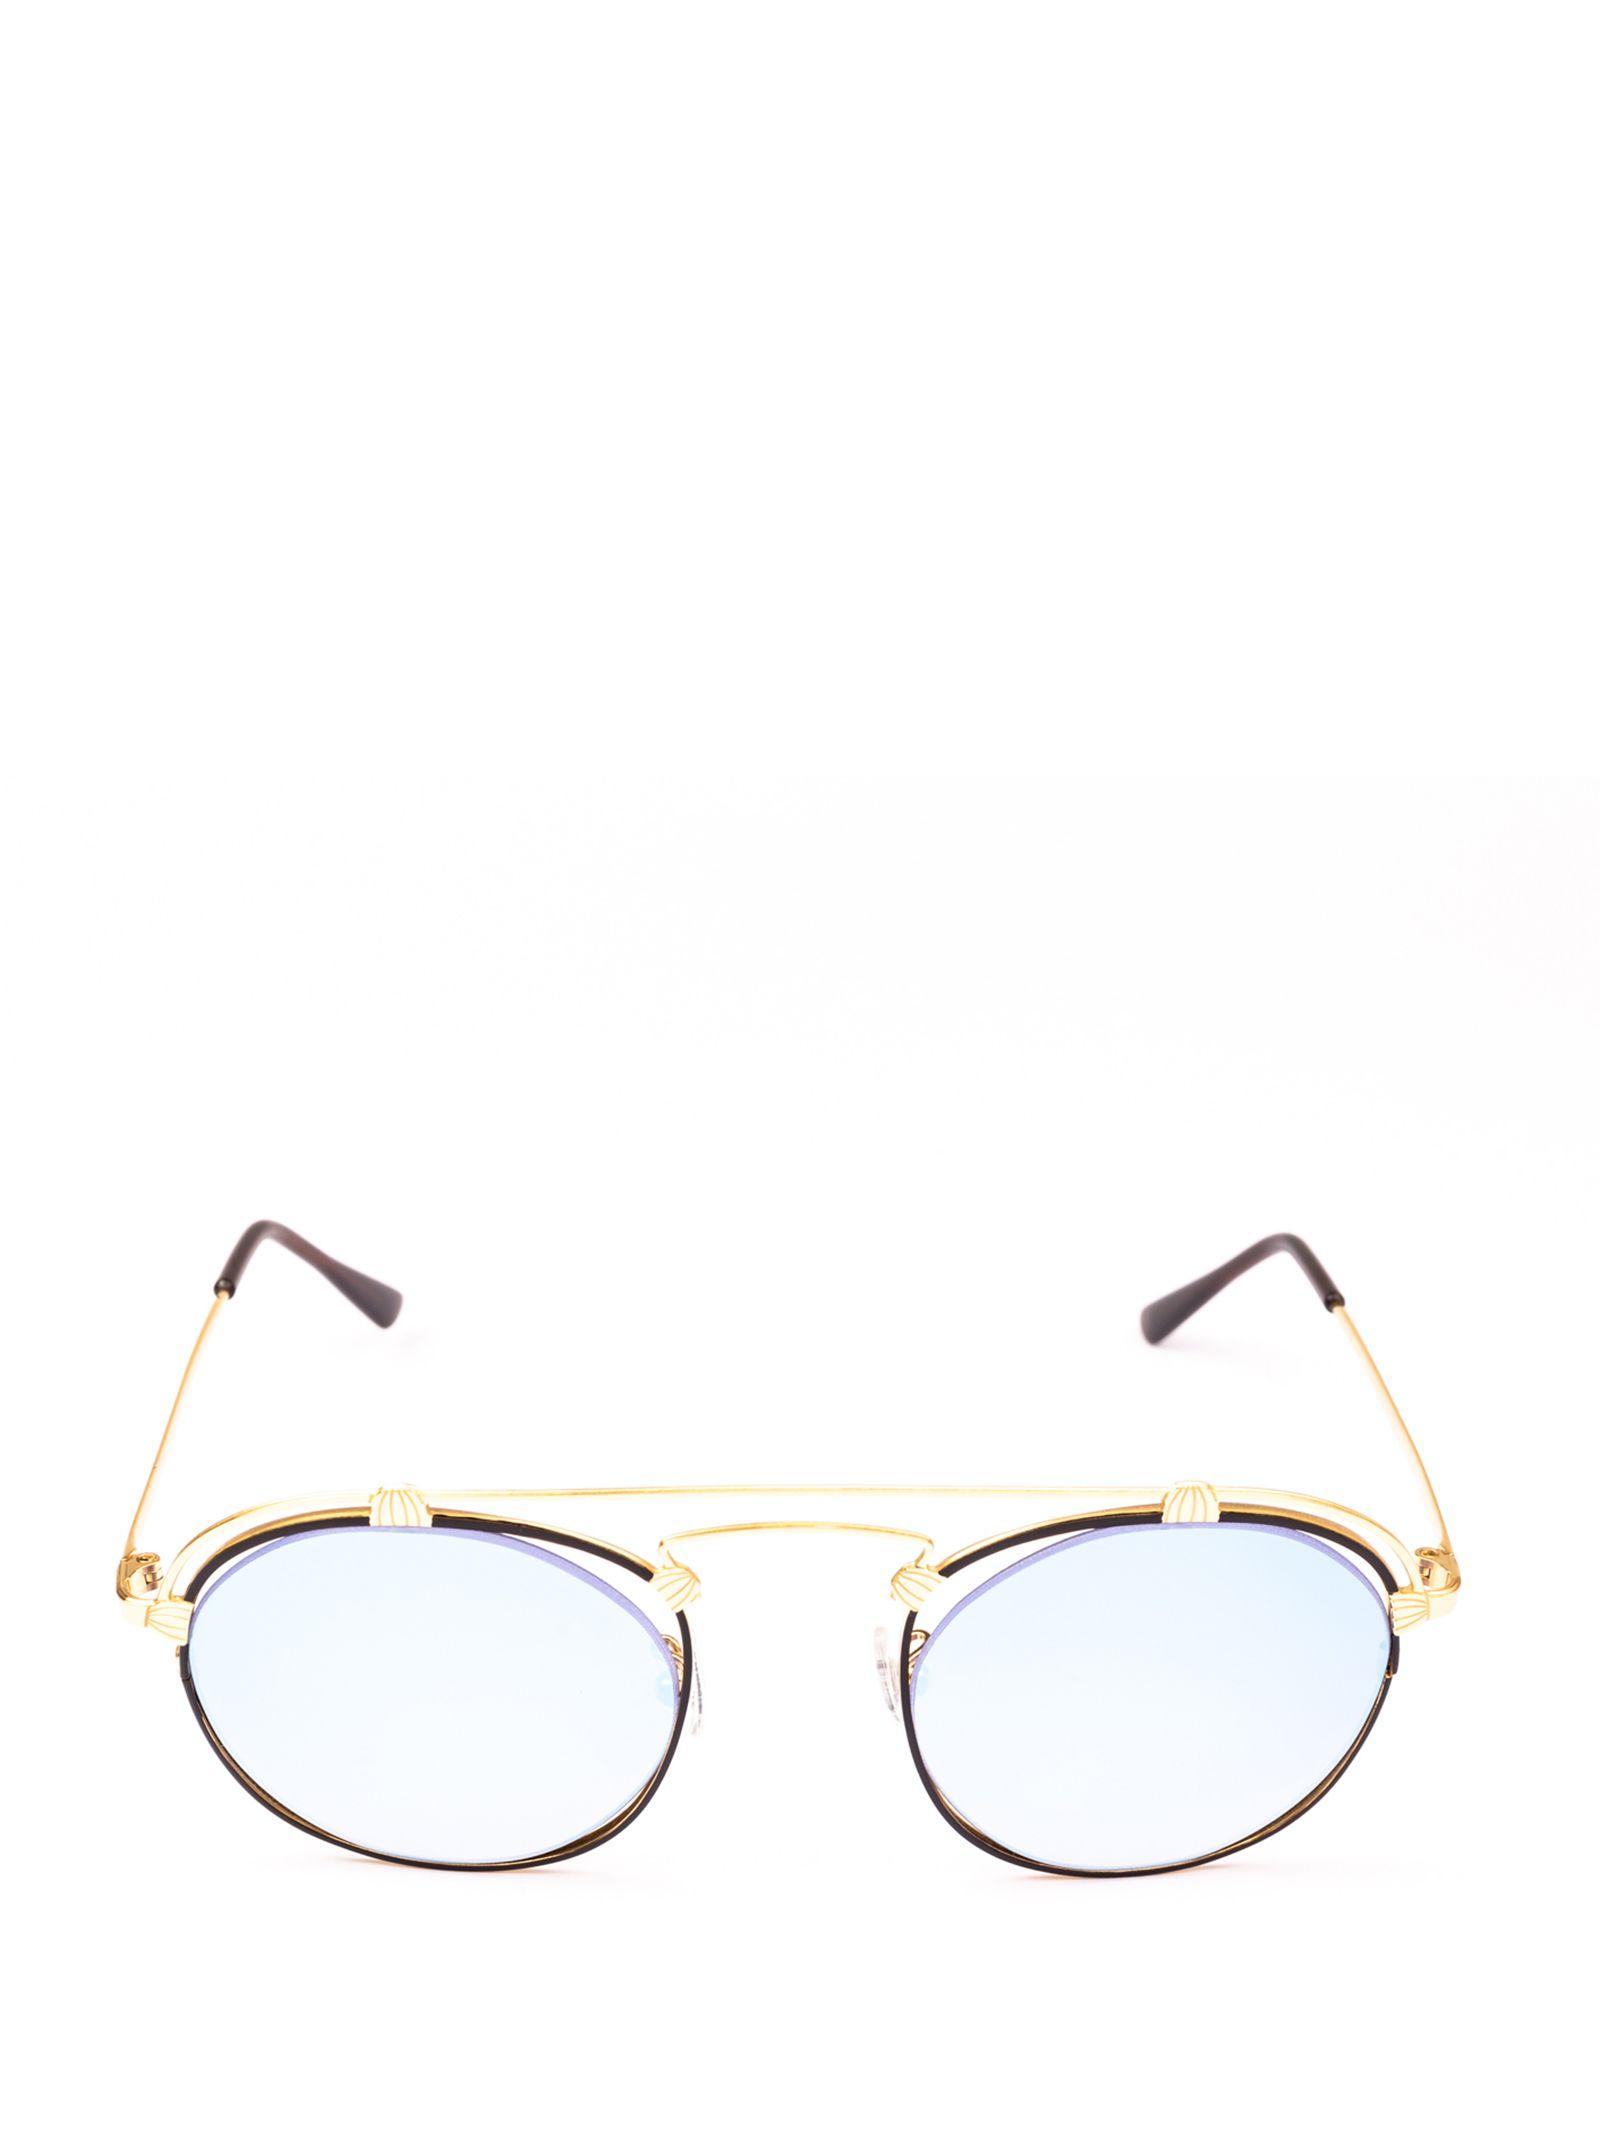 SPEKTRE Sunglasses in Cr01C